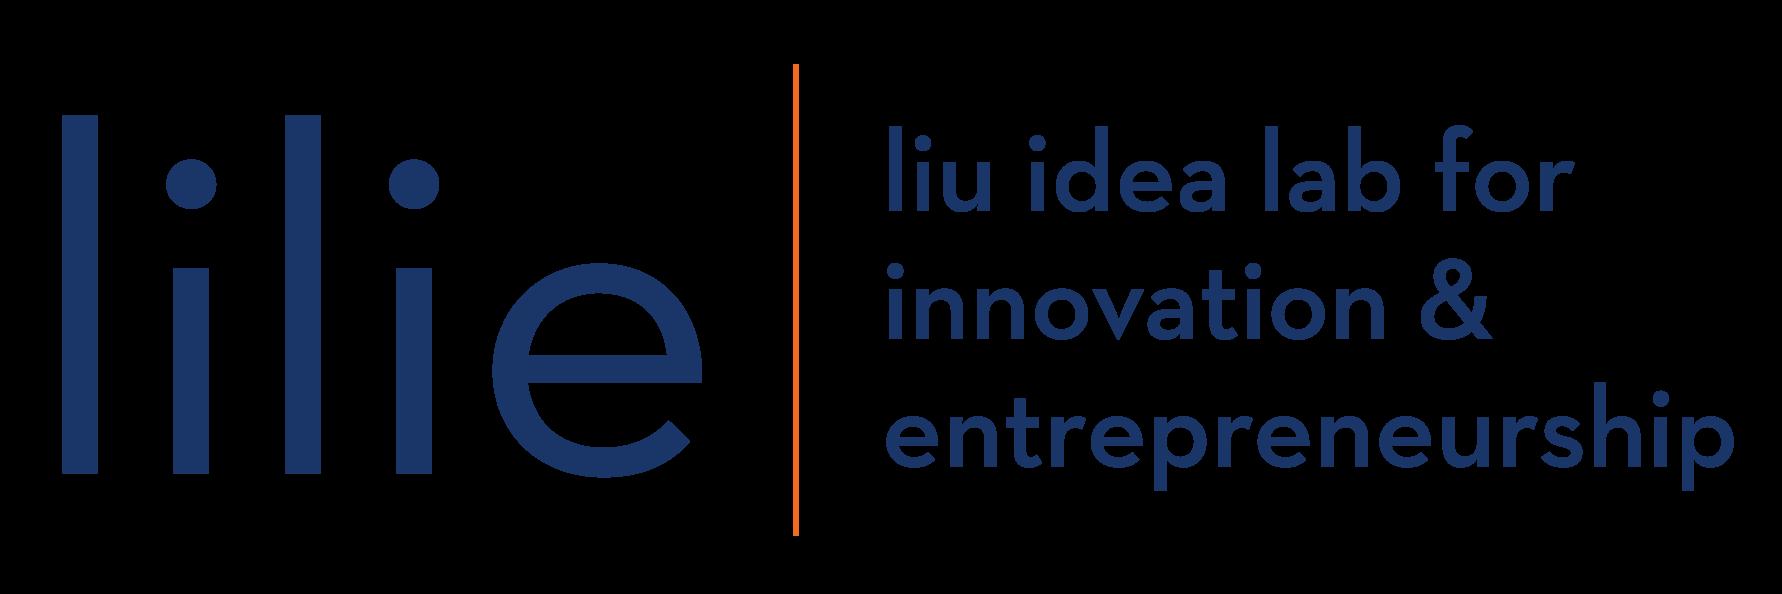 Lilie Lab logo